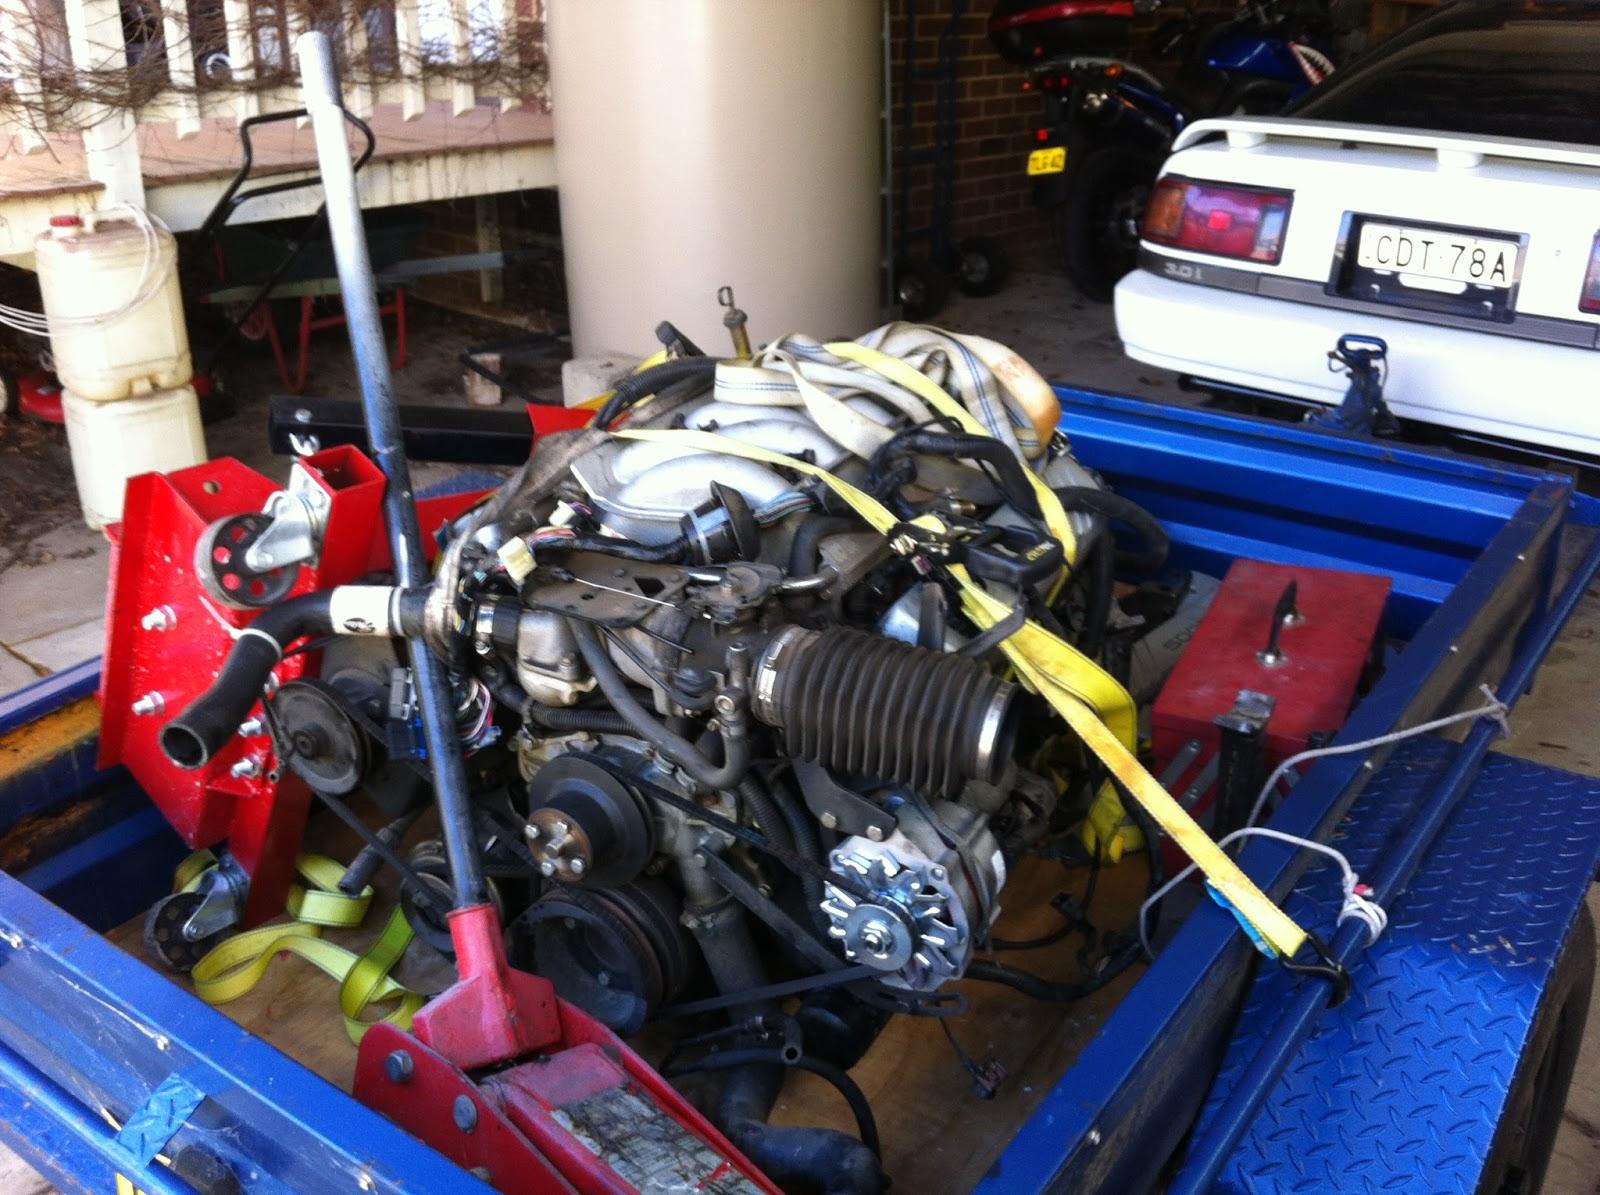 Xjs Engine Wiring Diagram Jaguar Xj6 Harness Restoration Modification Obtaining An Old